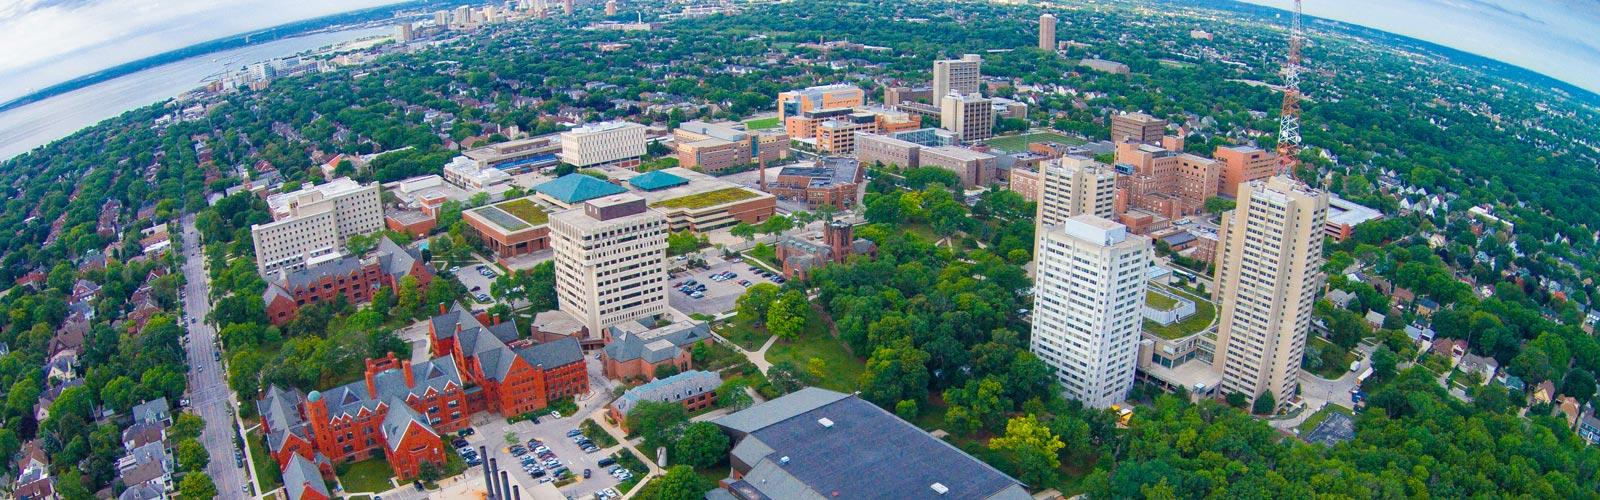 Undergraduate Admissions With Regard To University Of Wisconsin Milwaukee Calendar